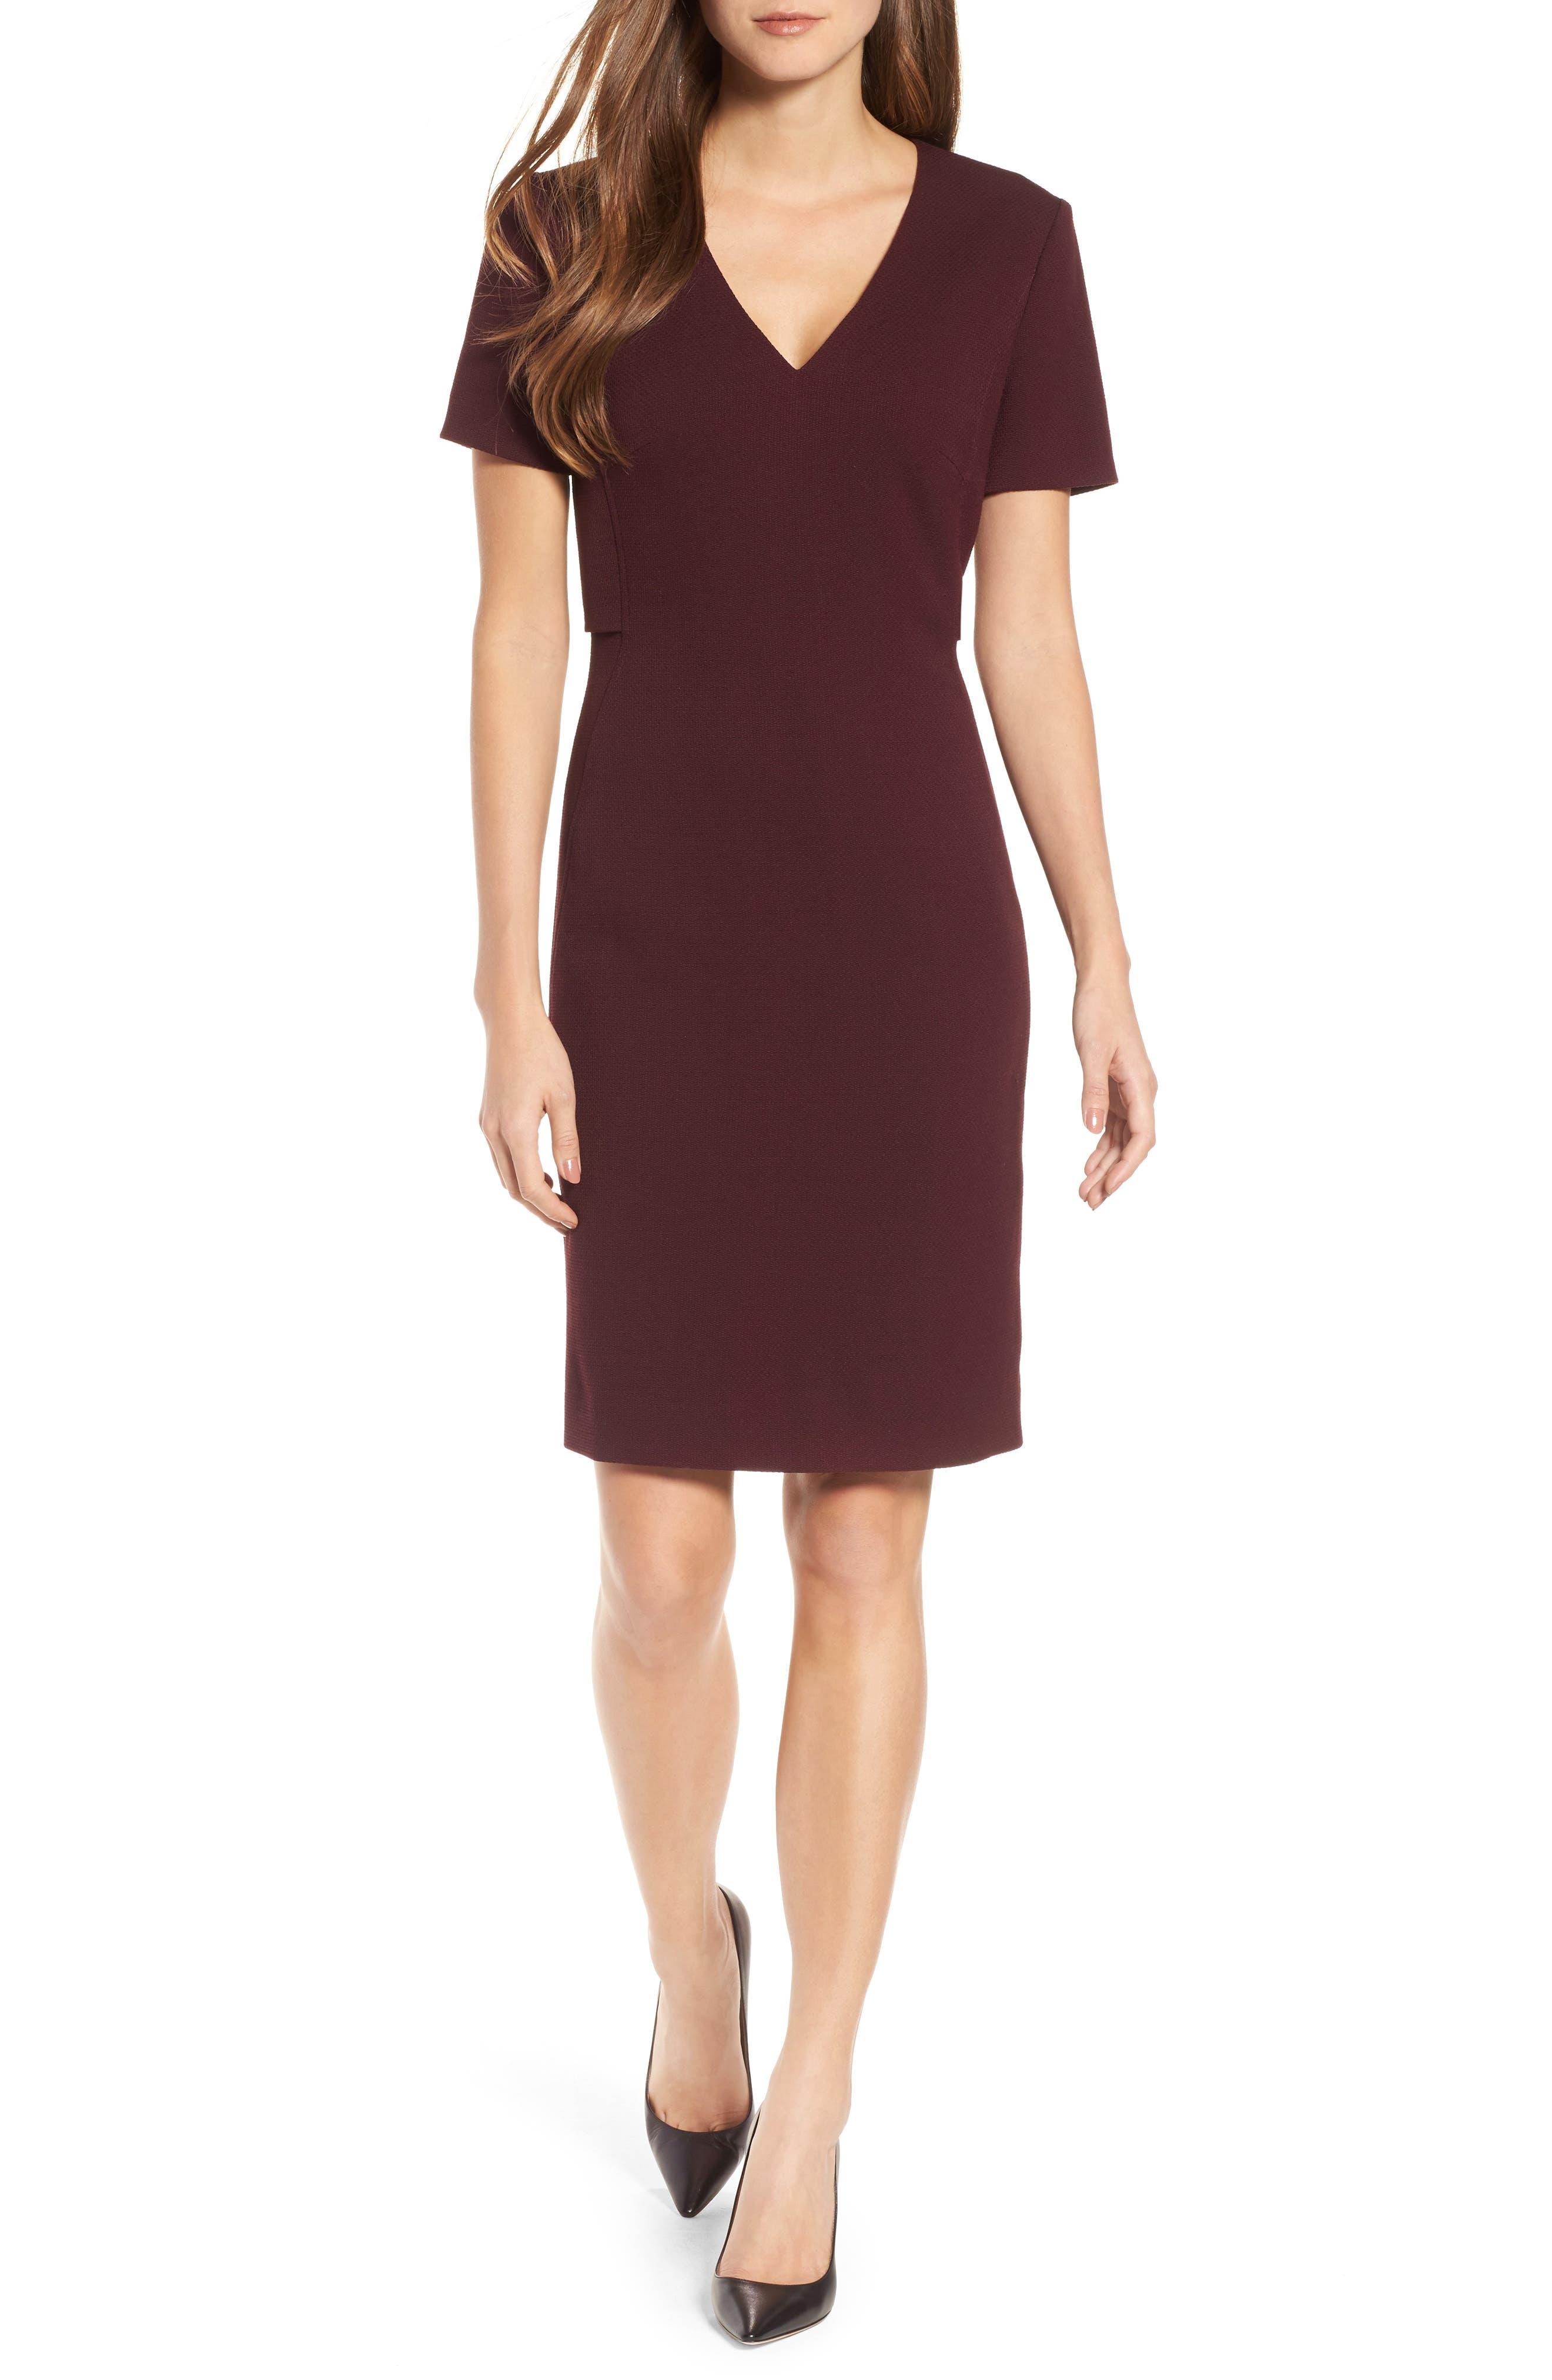 Domandia Stretch Wool Sheath Dress,                         Main,                         color, Mulberry